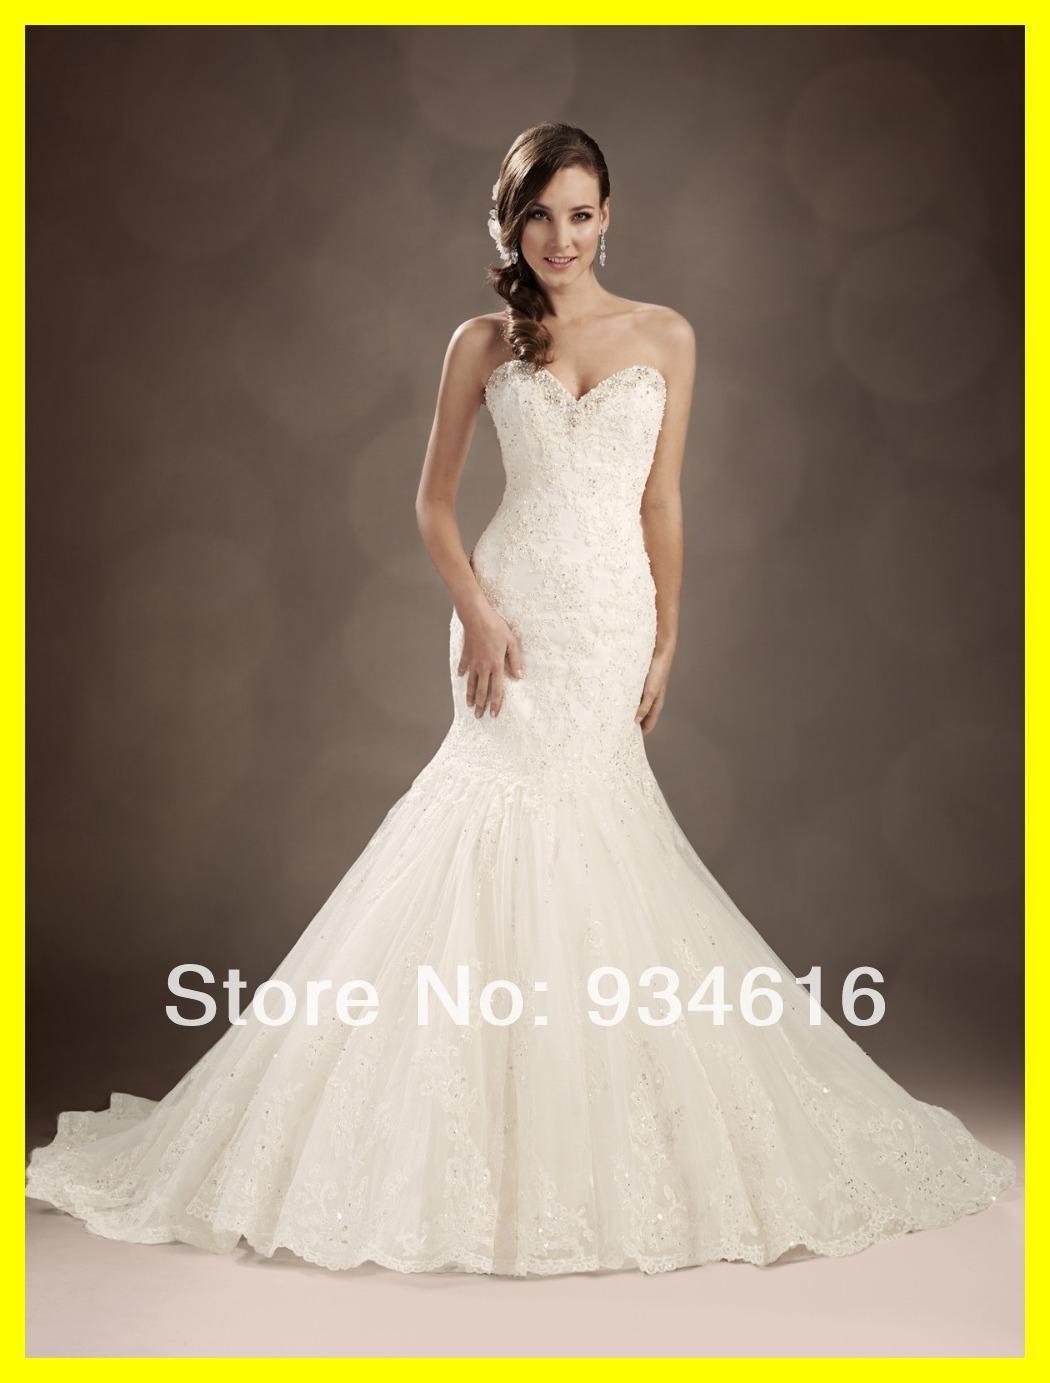 Cotton Wedding Dresses High Street Dress Second Jj Sheath Mermaid Floor-Length Chapel Train Appliques Sweetheart Off 2015 Cheap(China (Mainland))